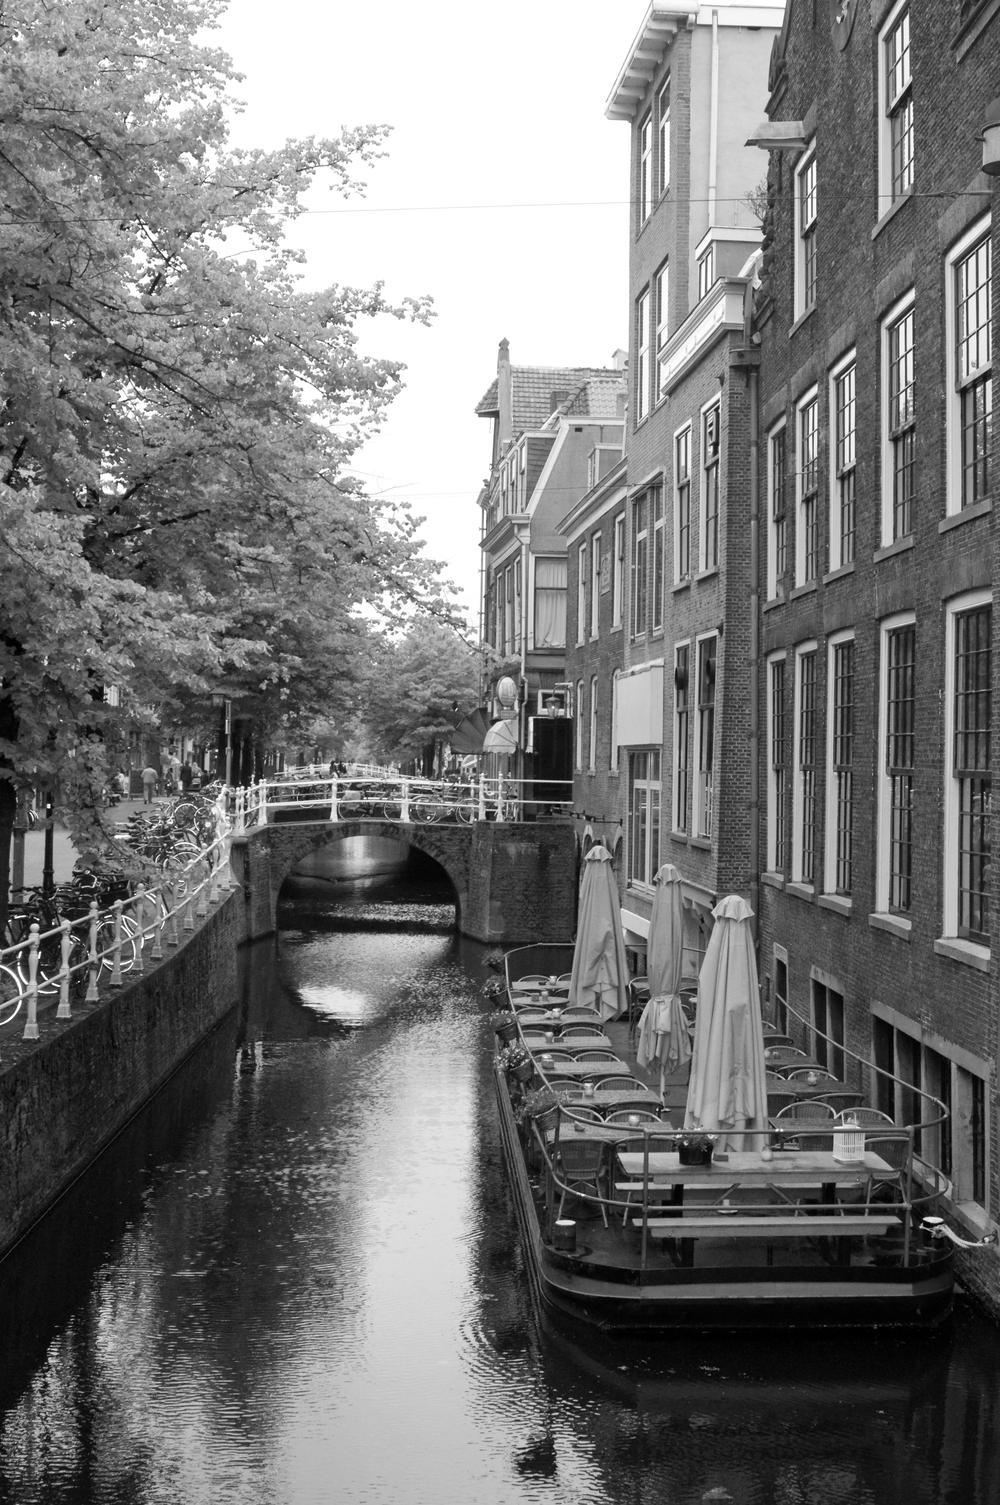 TheVermeerJump_Delft_6138.jpg